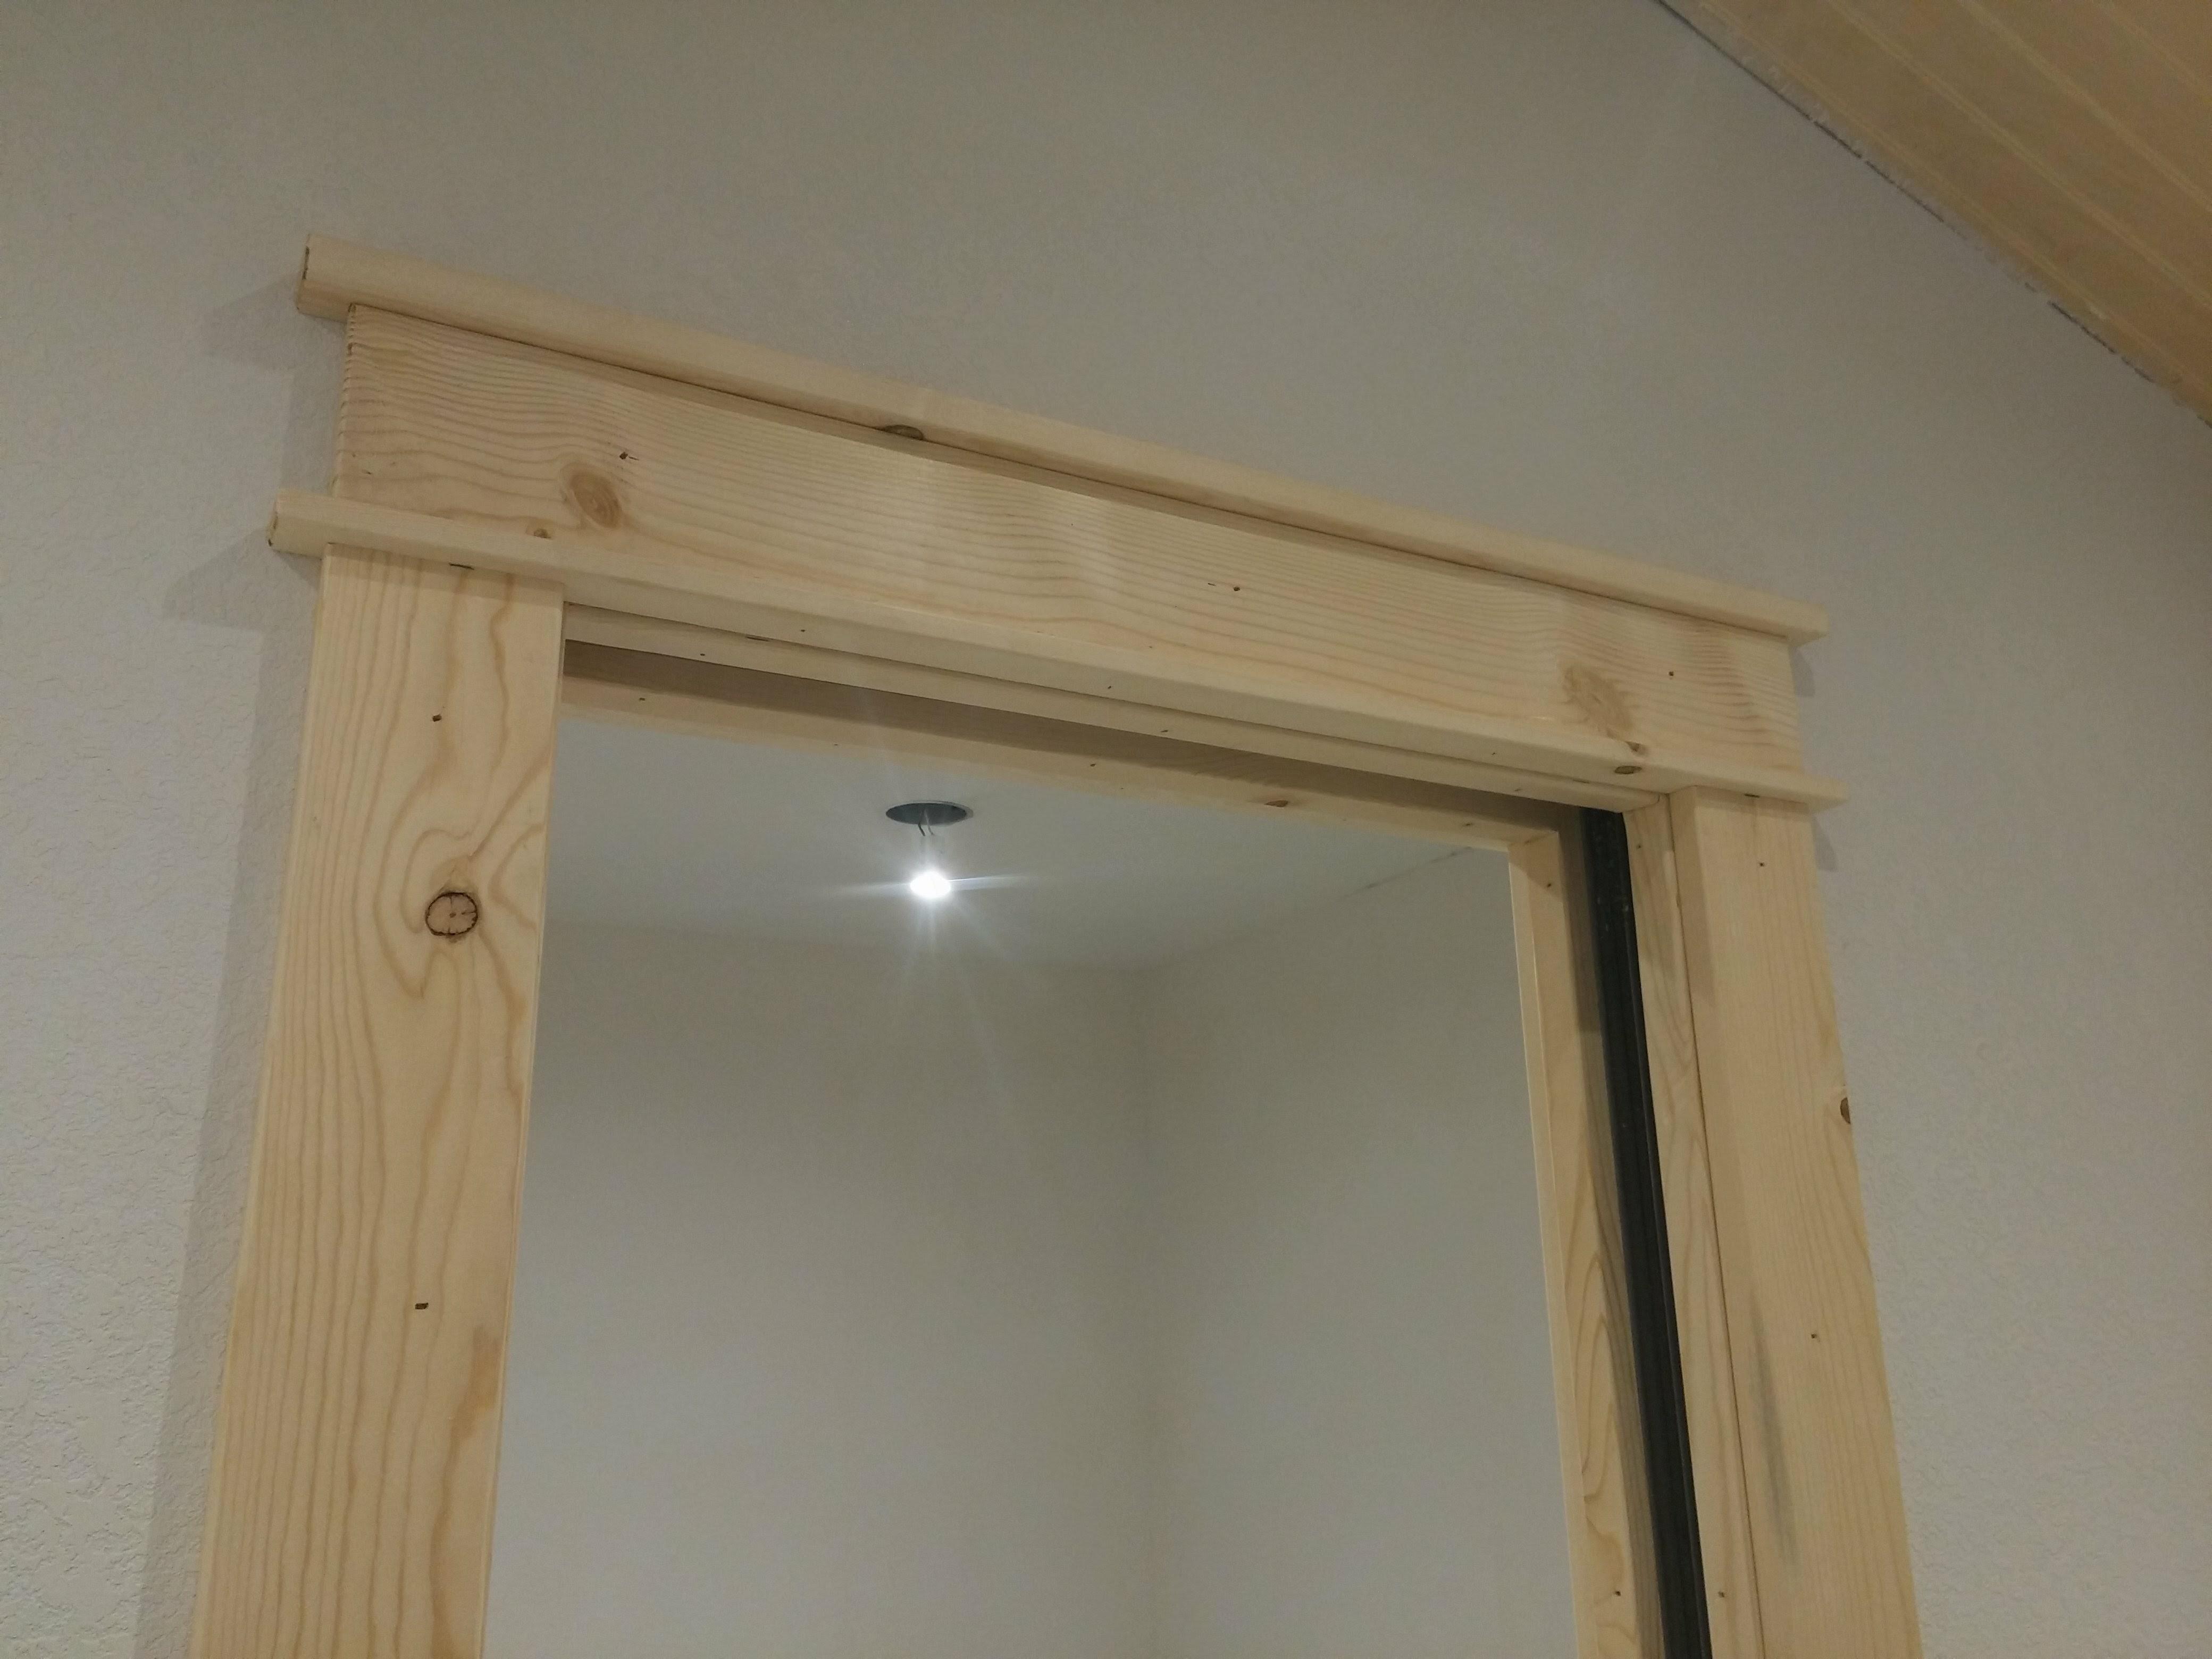 Installing Pocket Doors Ryan Hobbies